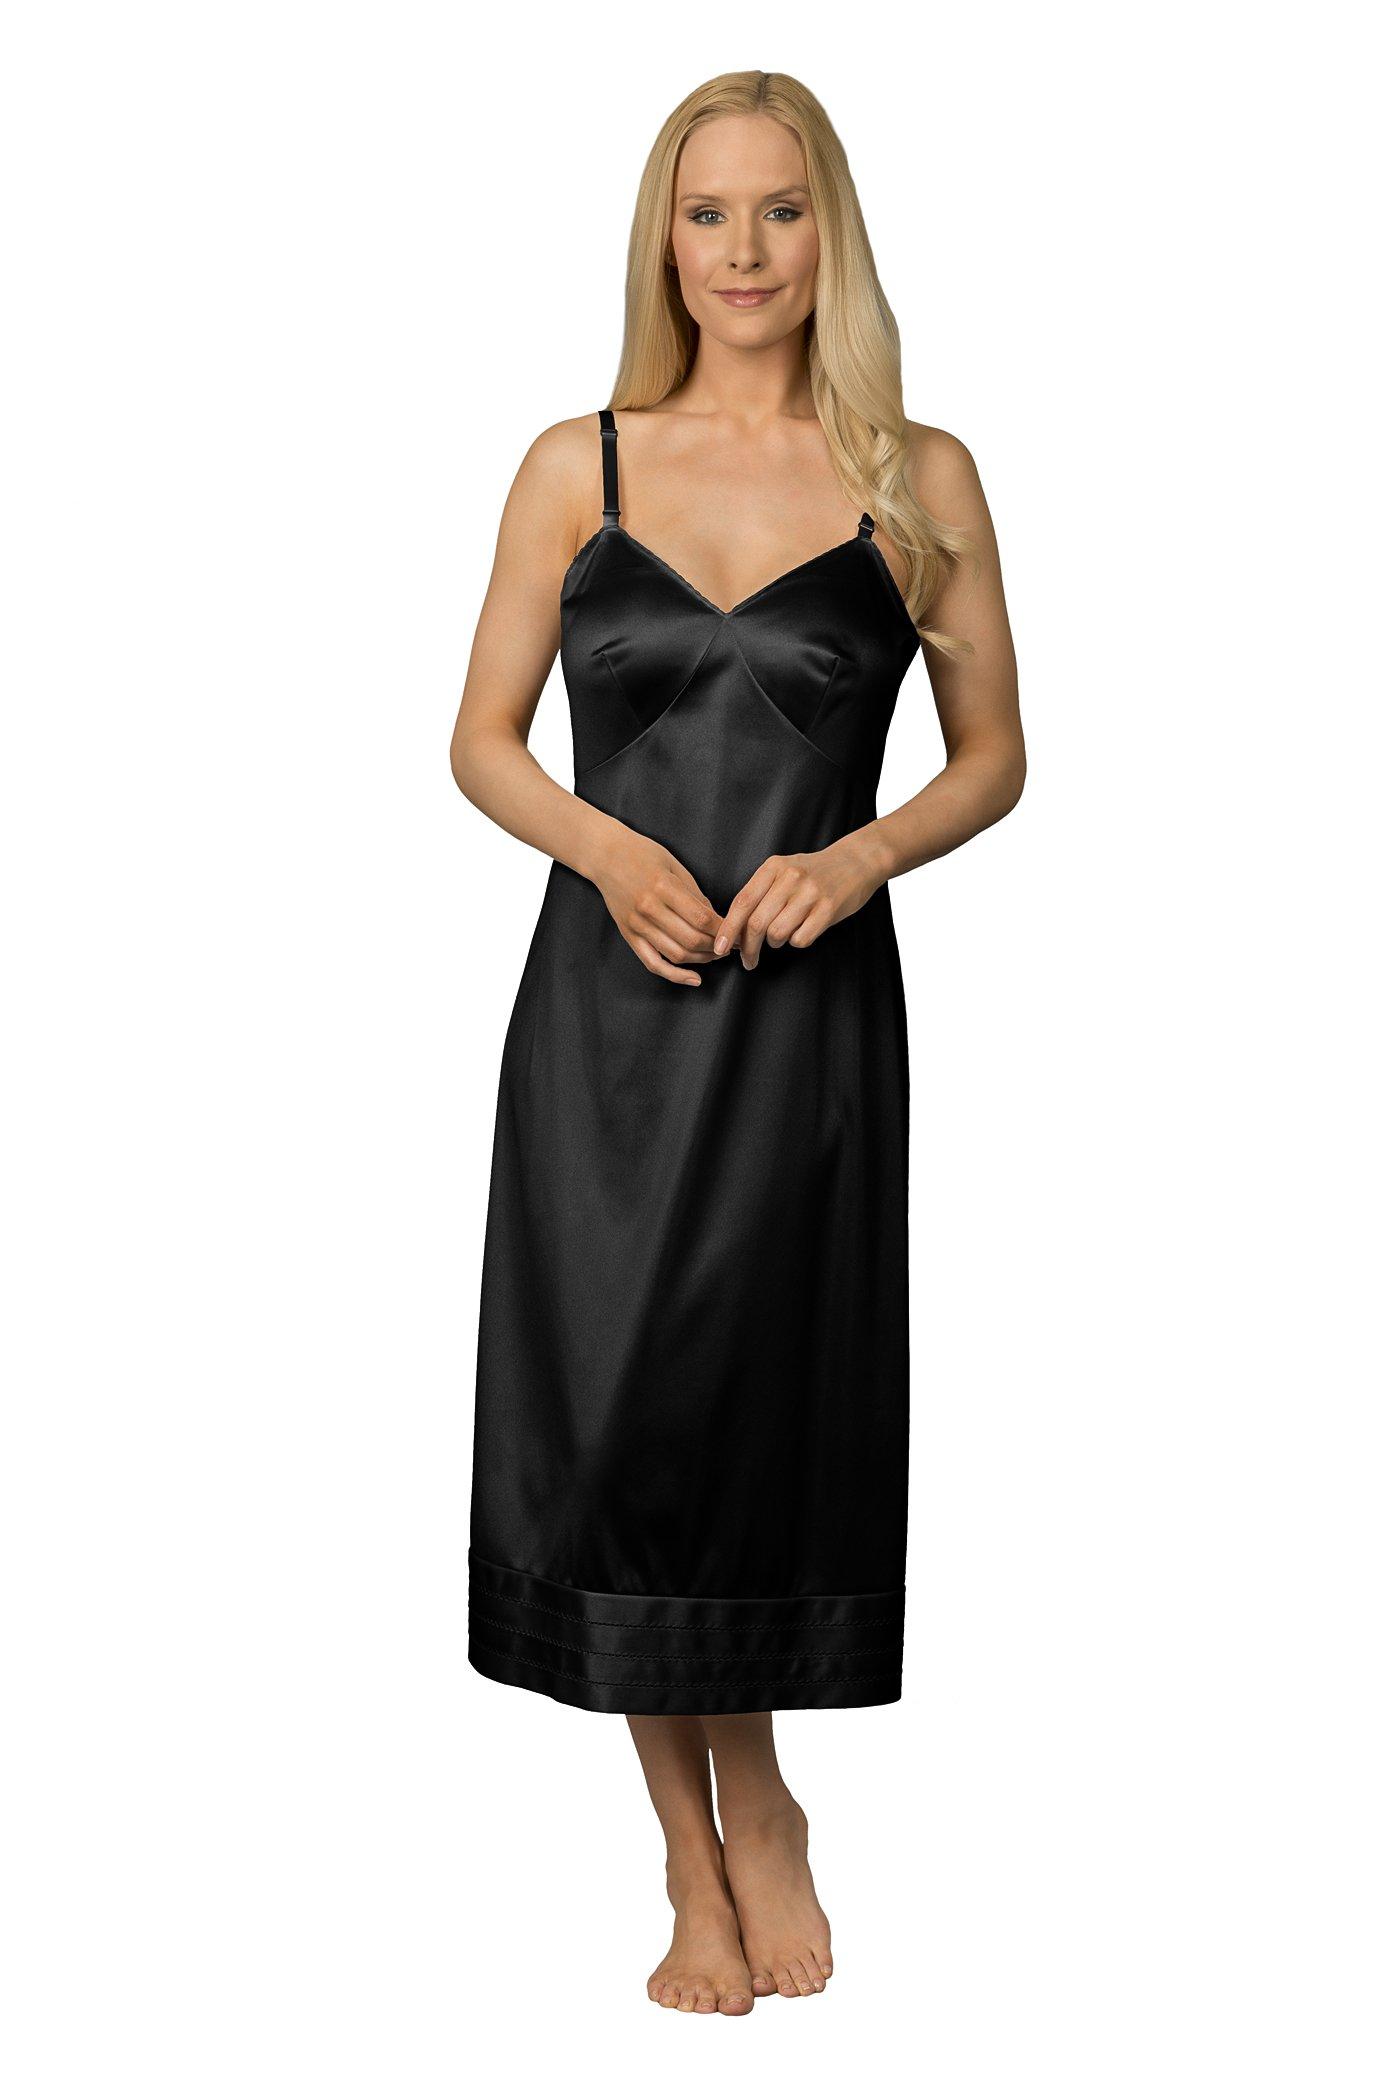 Best Rated in Women s Full Slips   Helpful Customer Reviews - Amazon.com 052300793